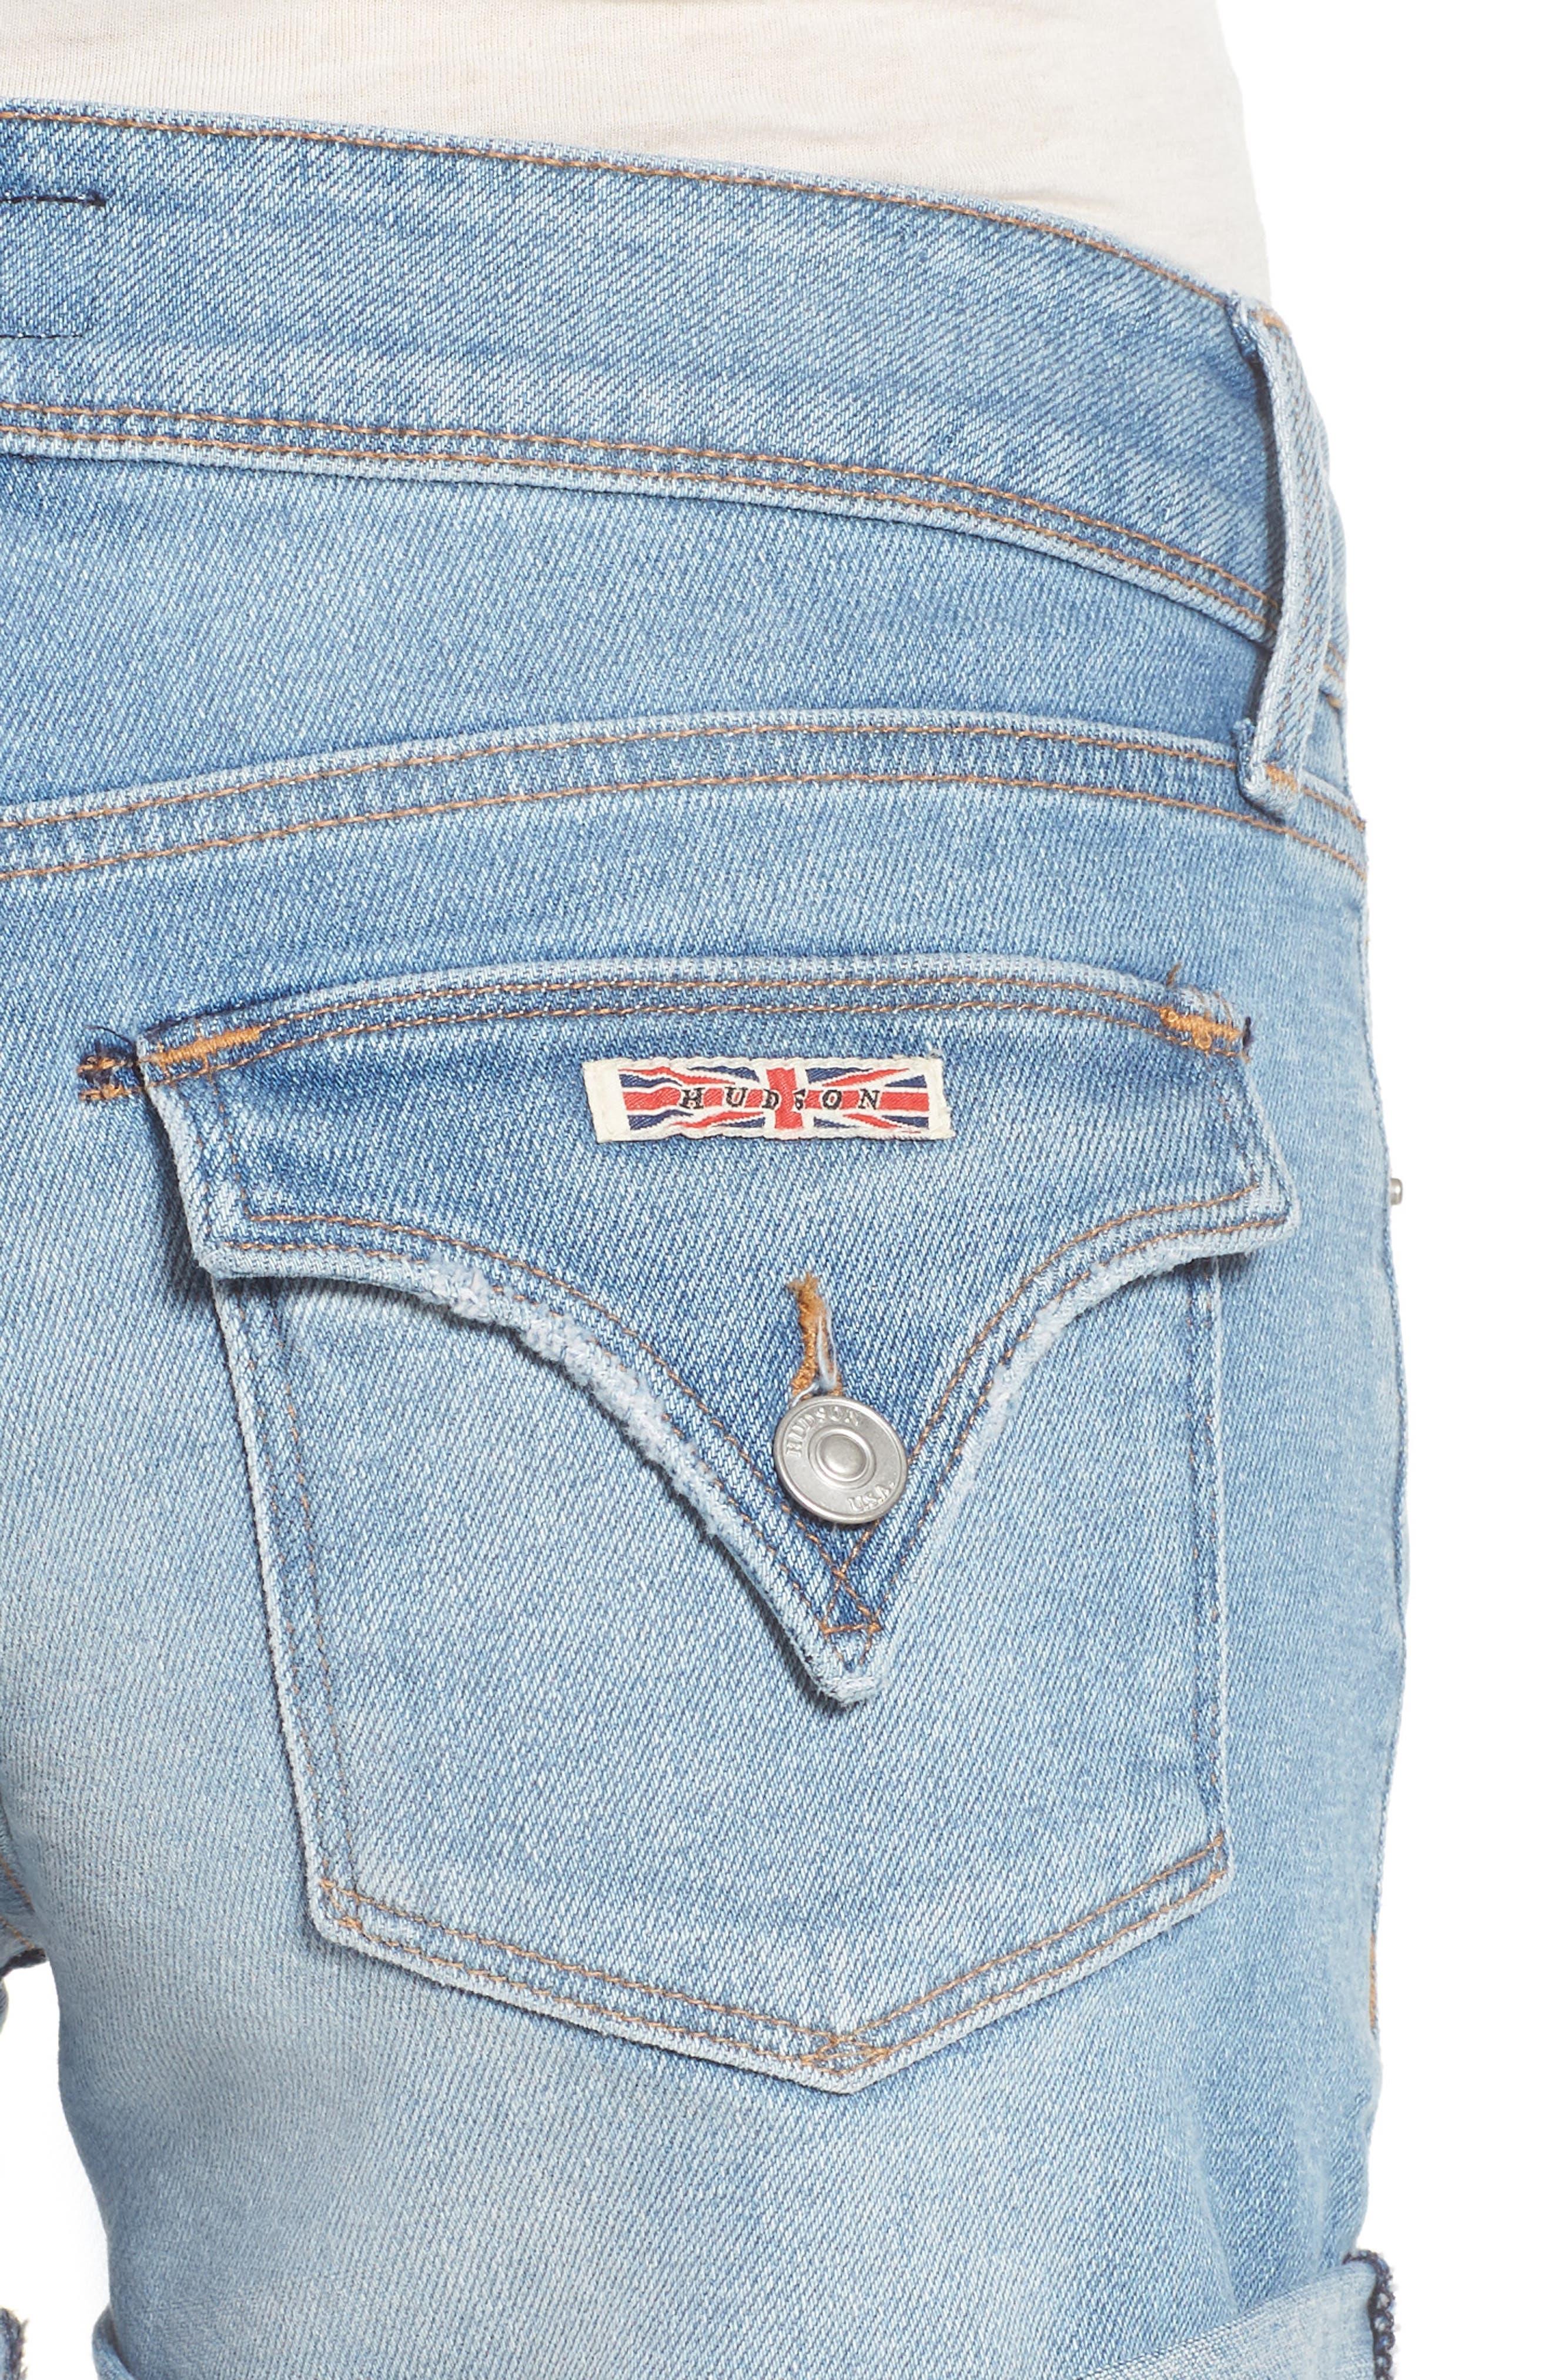 HUDSON JEANS,                             Croxley Cuff Denim Shorts,                             Alternate thumbnail 4, color,                             425